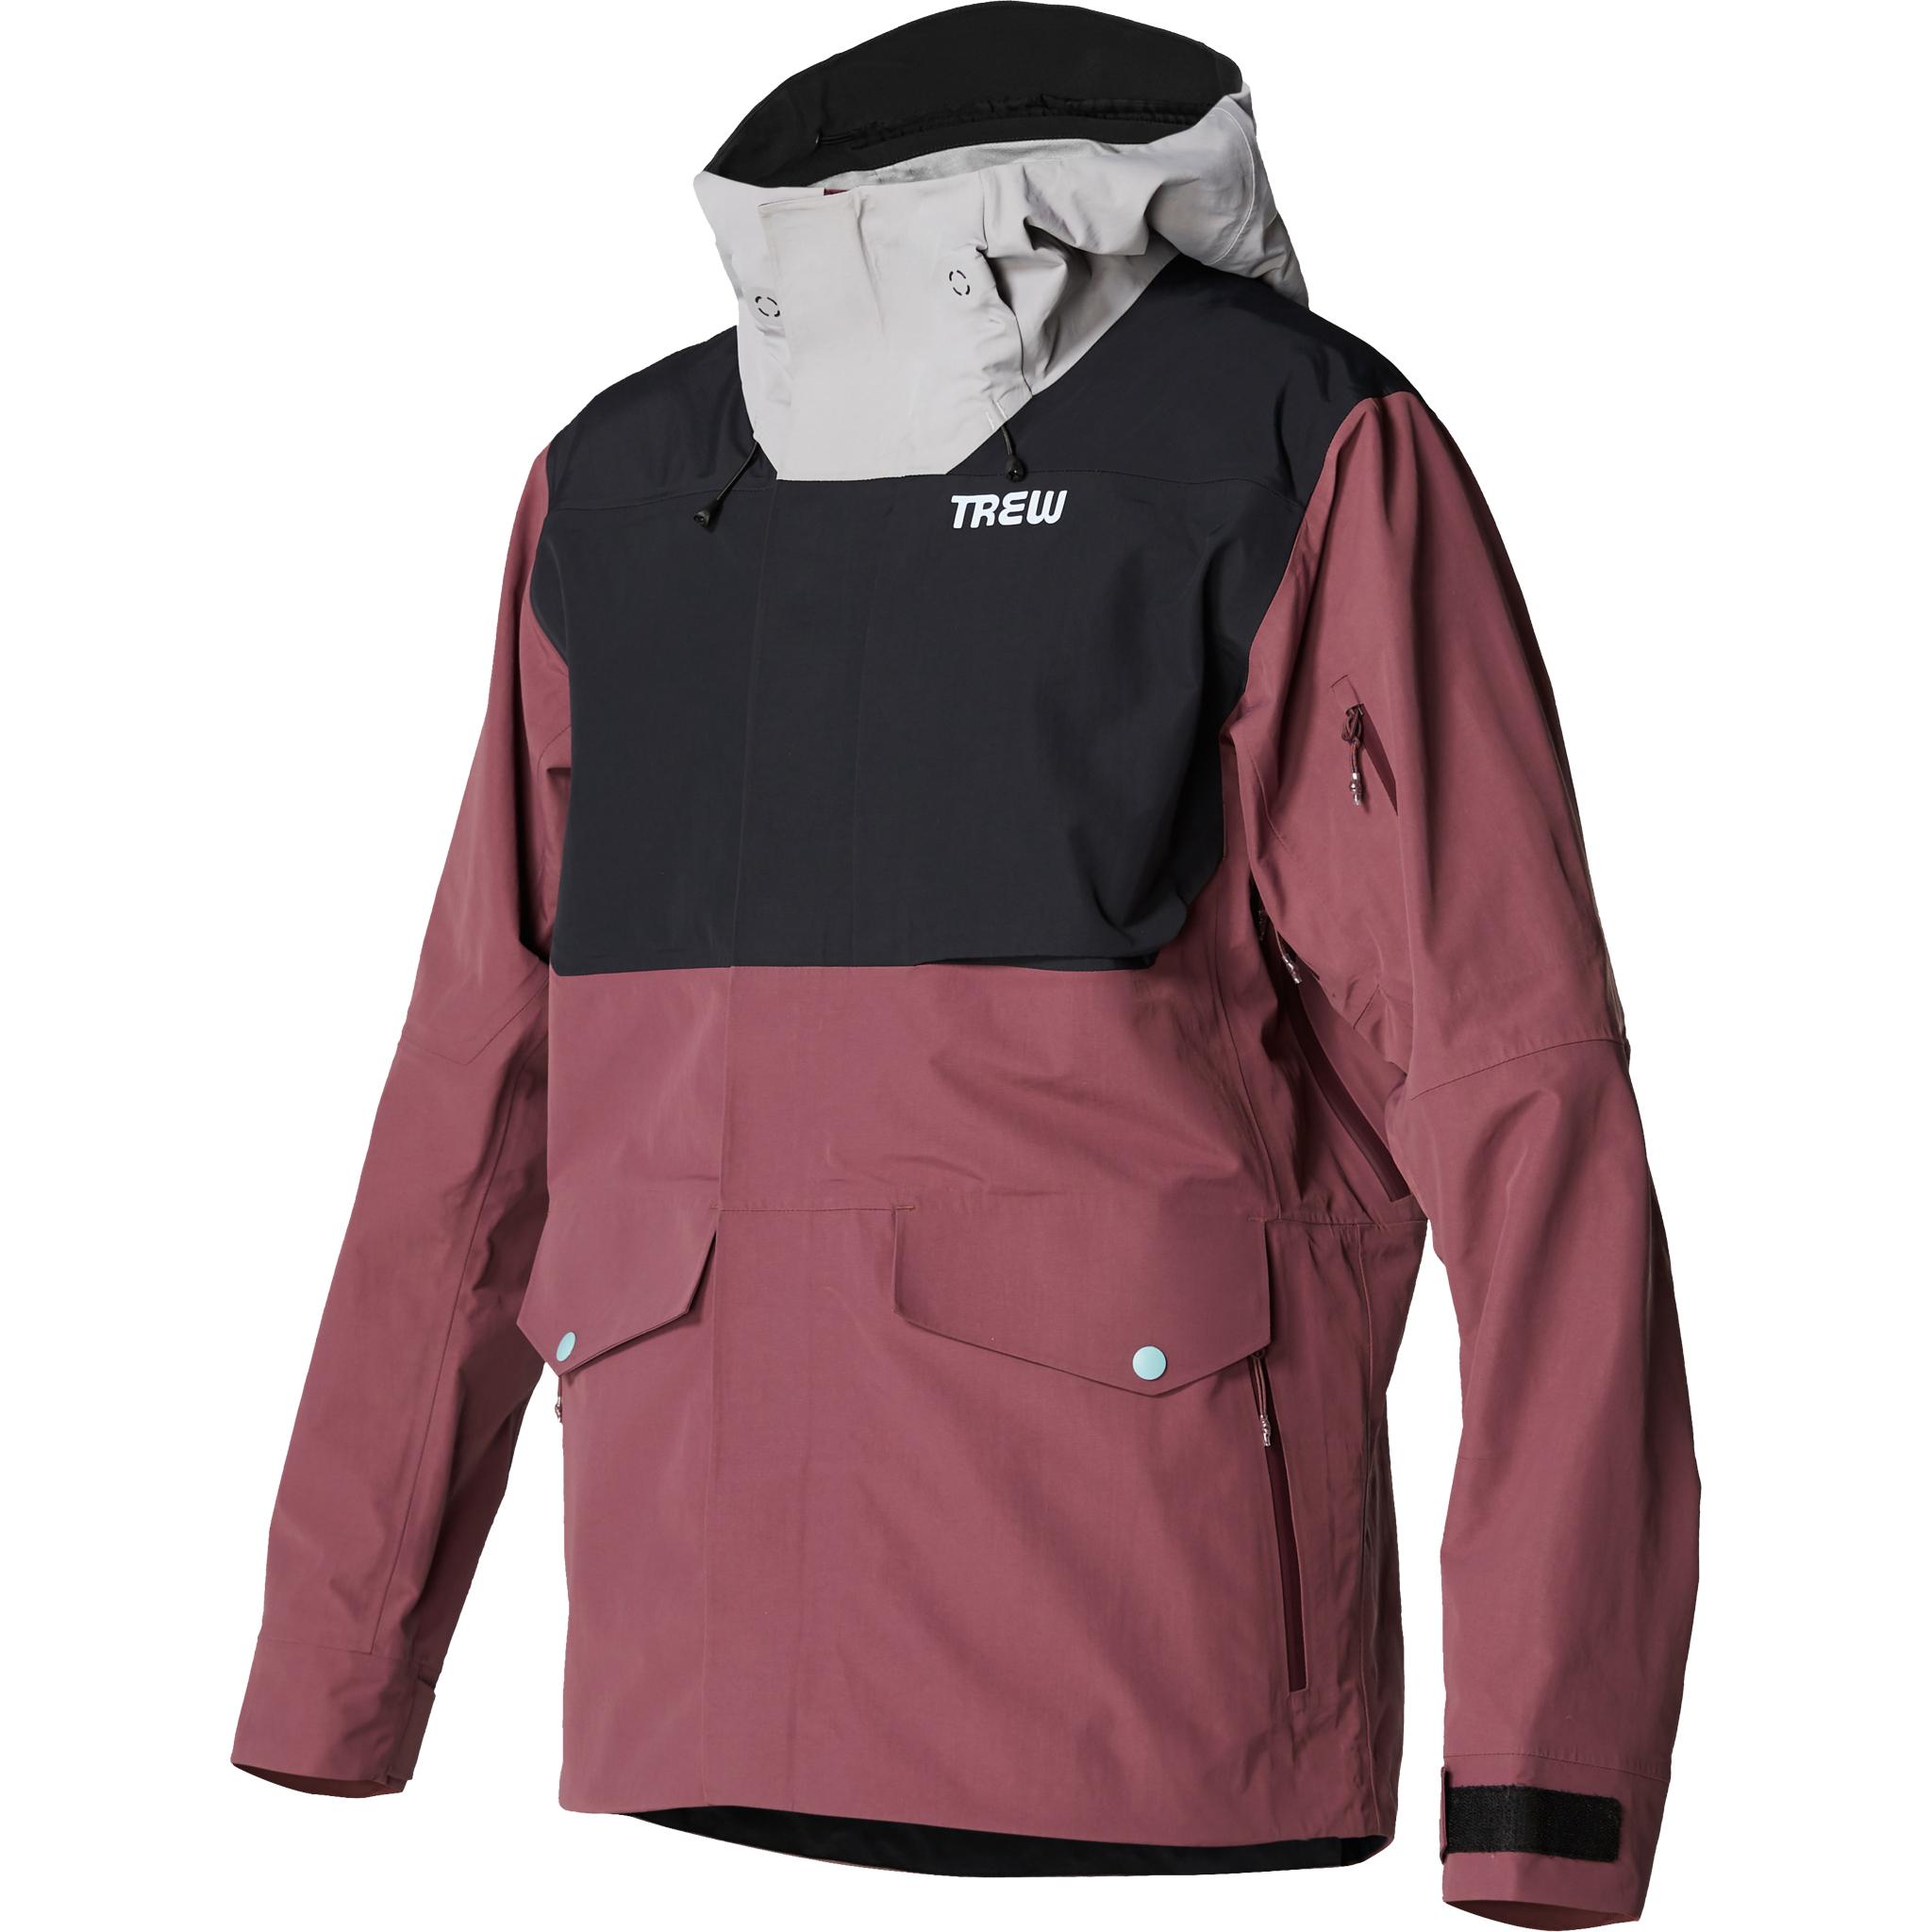 Trew Powfunk Jacket